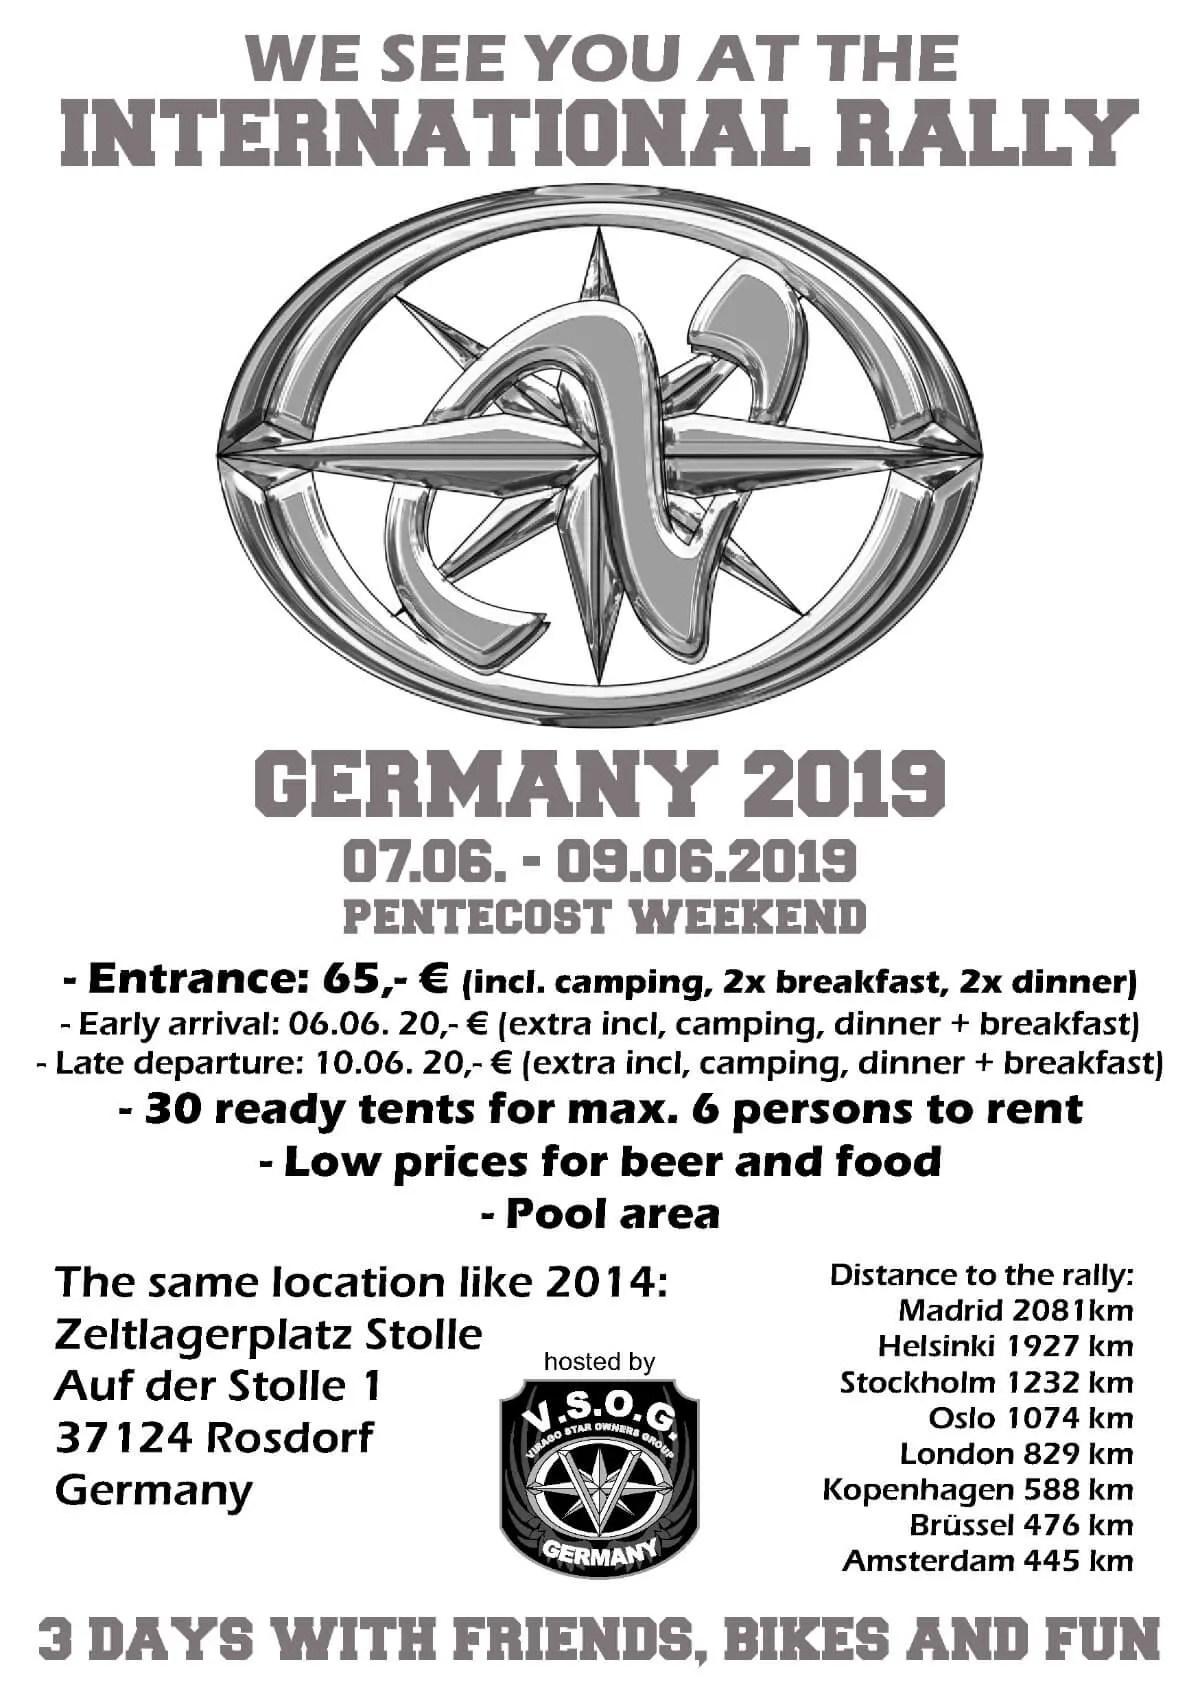 International Rally 2019 Germany